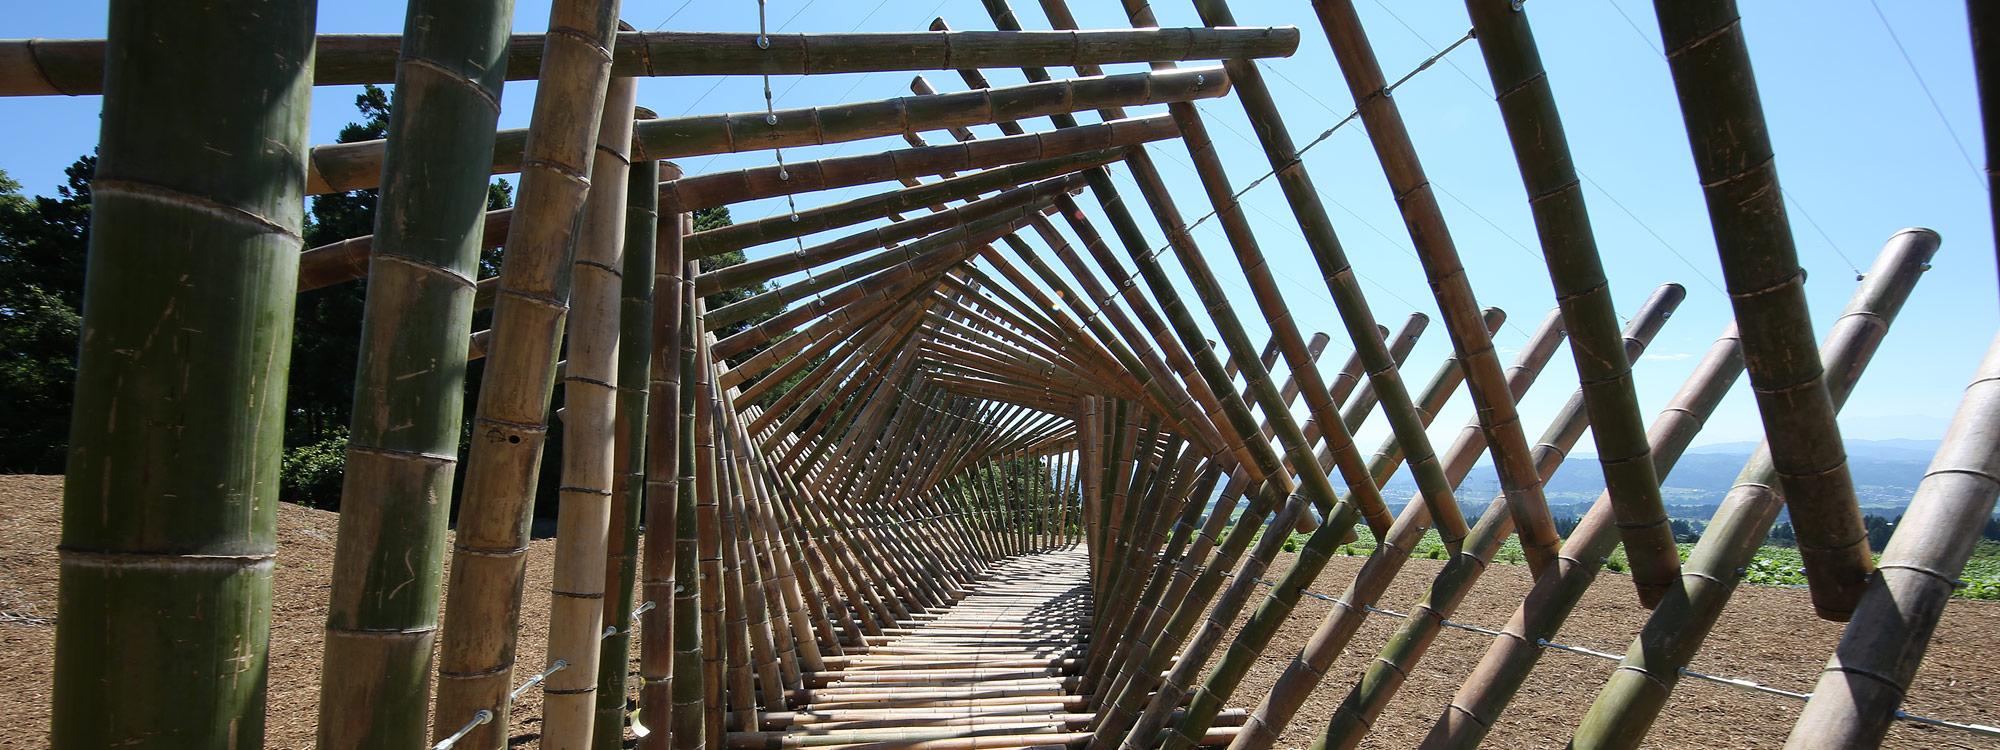 Echigo-Tsumari Triennale 2015 - große Fototour